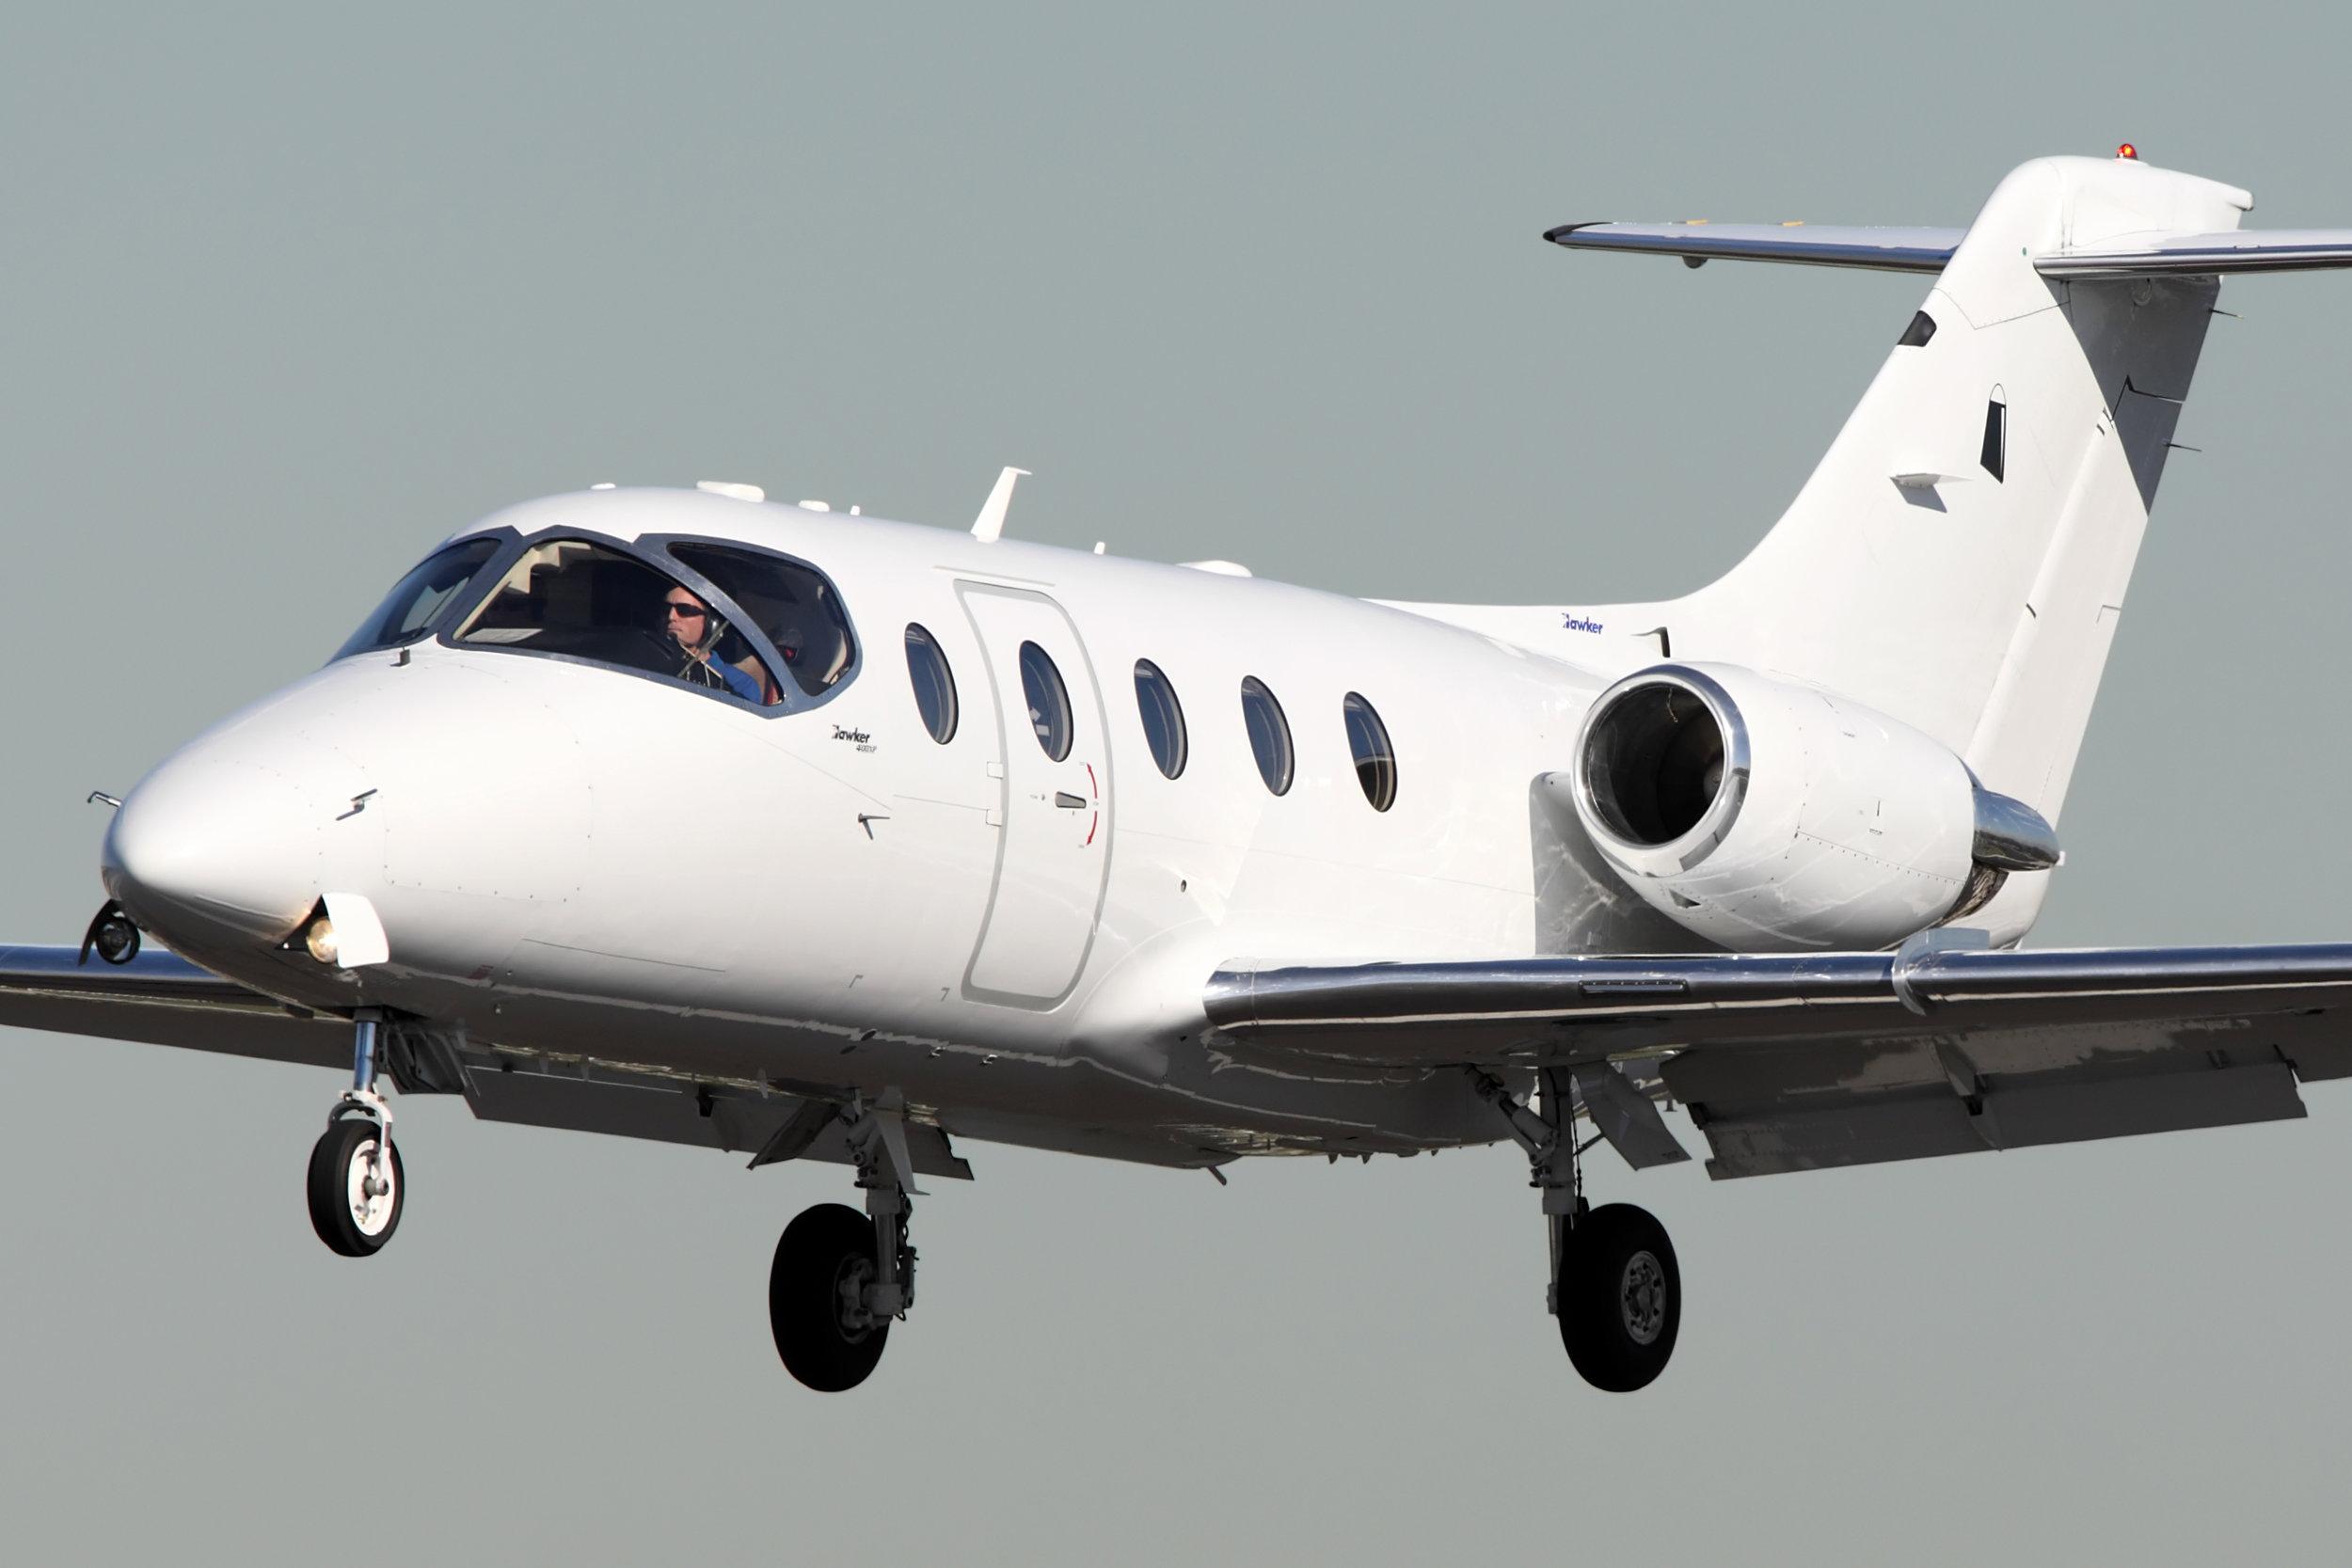 Hawker-400XP_landing_Light-jet_Legacy_Aviation_Private_Jet_NetJets_Jet_Charter_TEB_VNY_MIA_PBI_FRG_SFO_FLL_FXE_BED.jpg